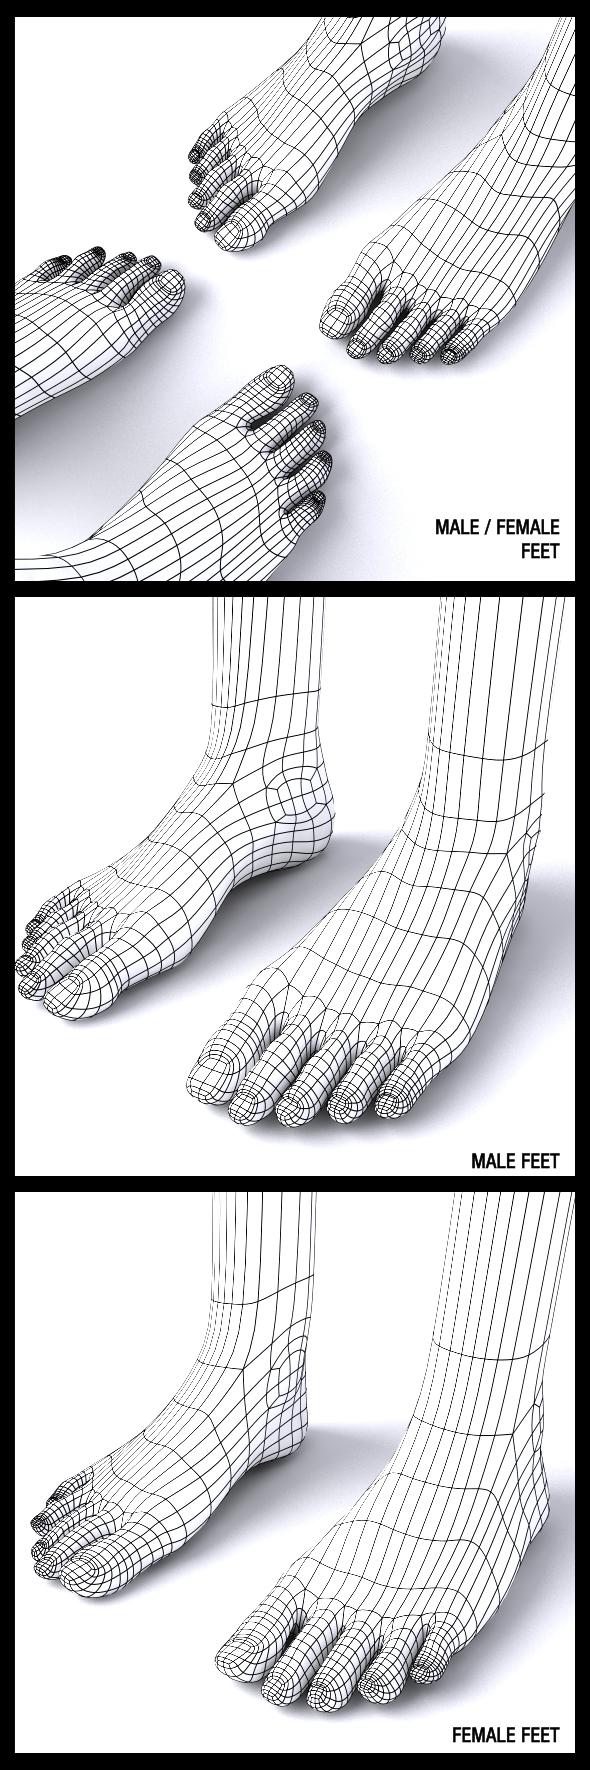 Male / Female Feet - 3DOcean Item for Sale